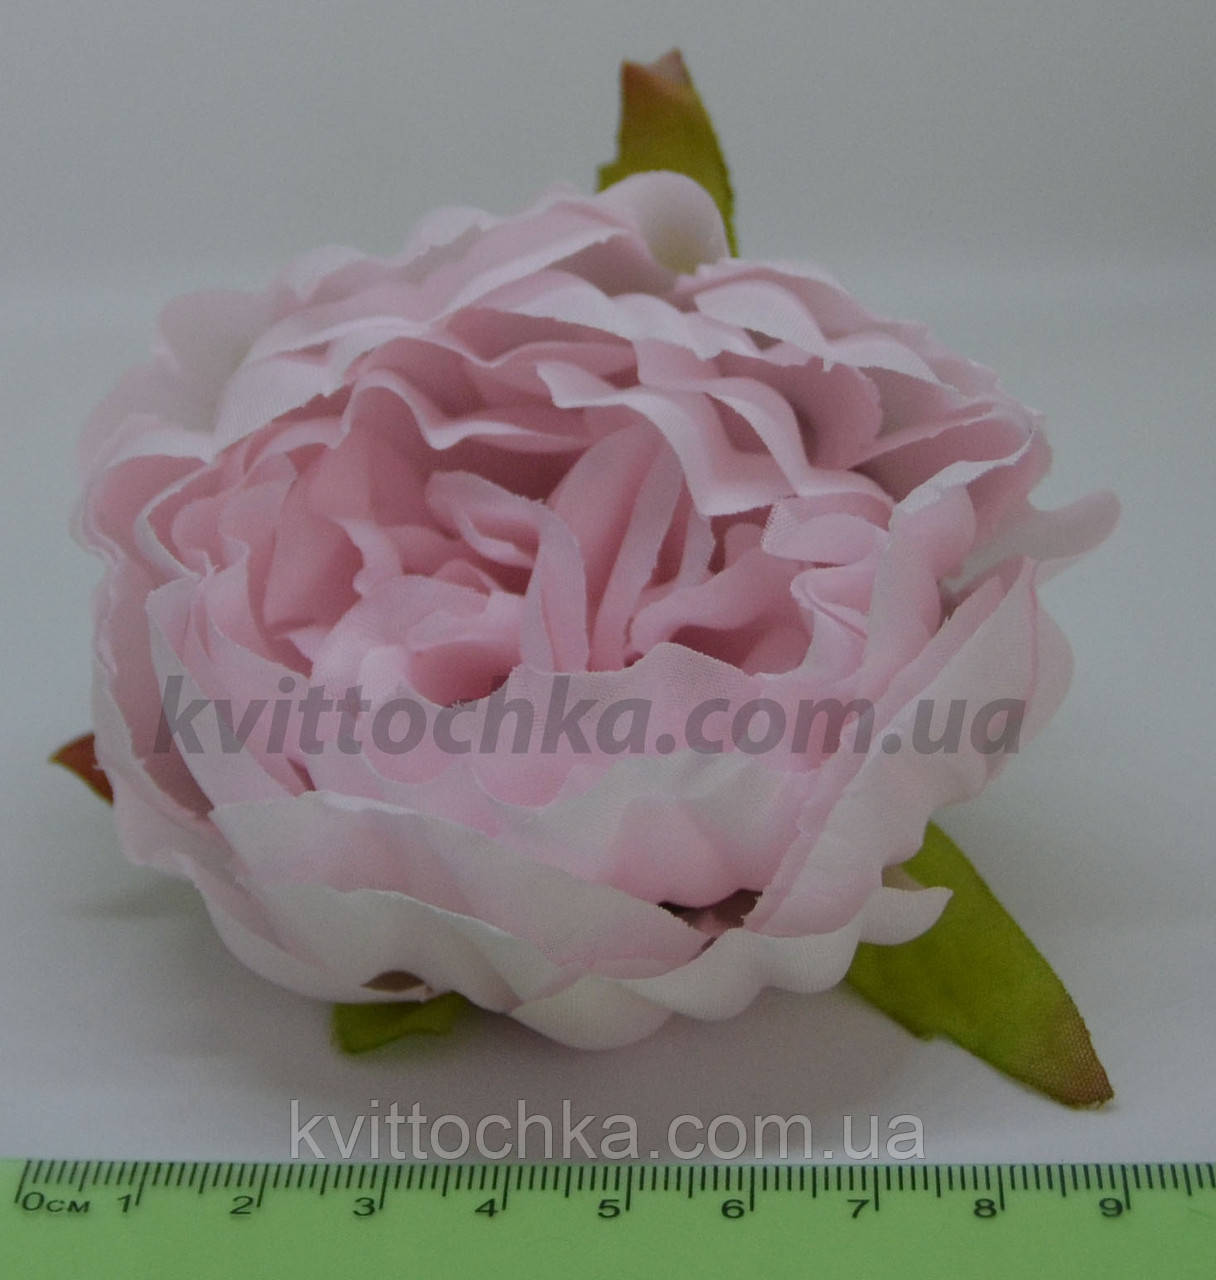 Голова цветка  пиона ,цена указа за 1 шт,диаметр цветка 10см